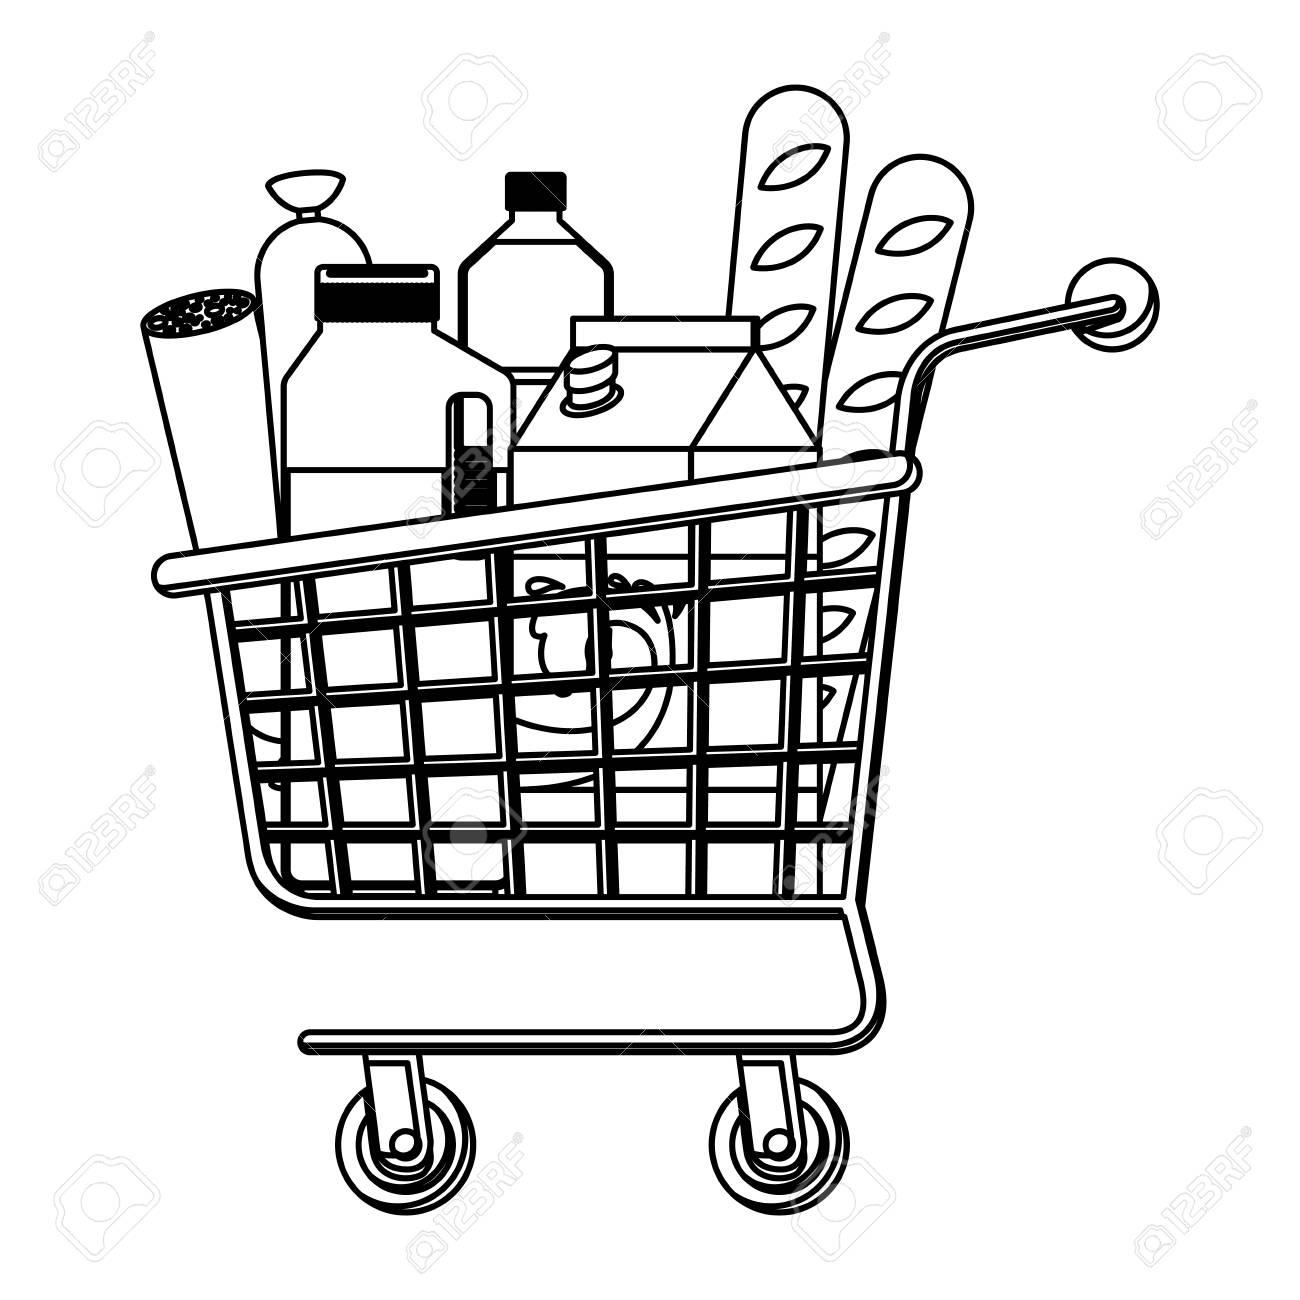 Supermarket Drawing At Getdrawings